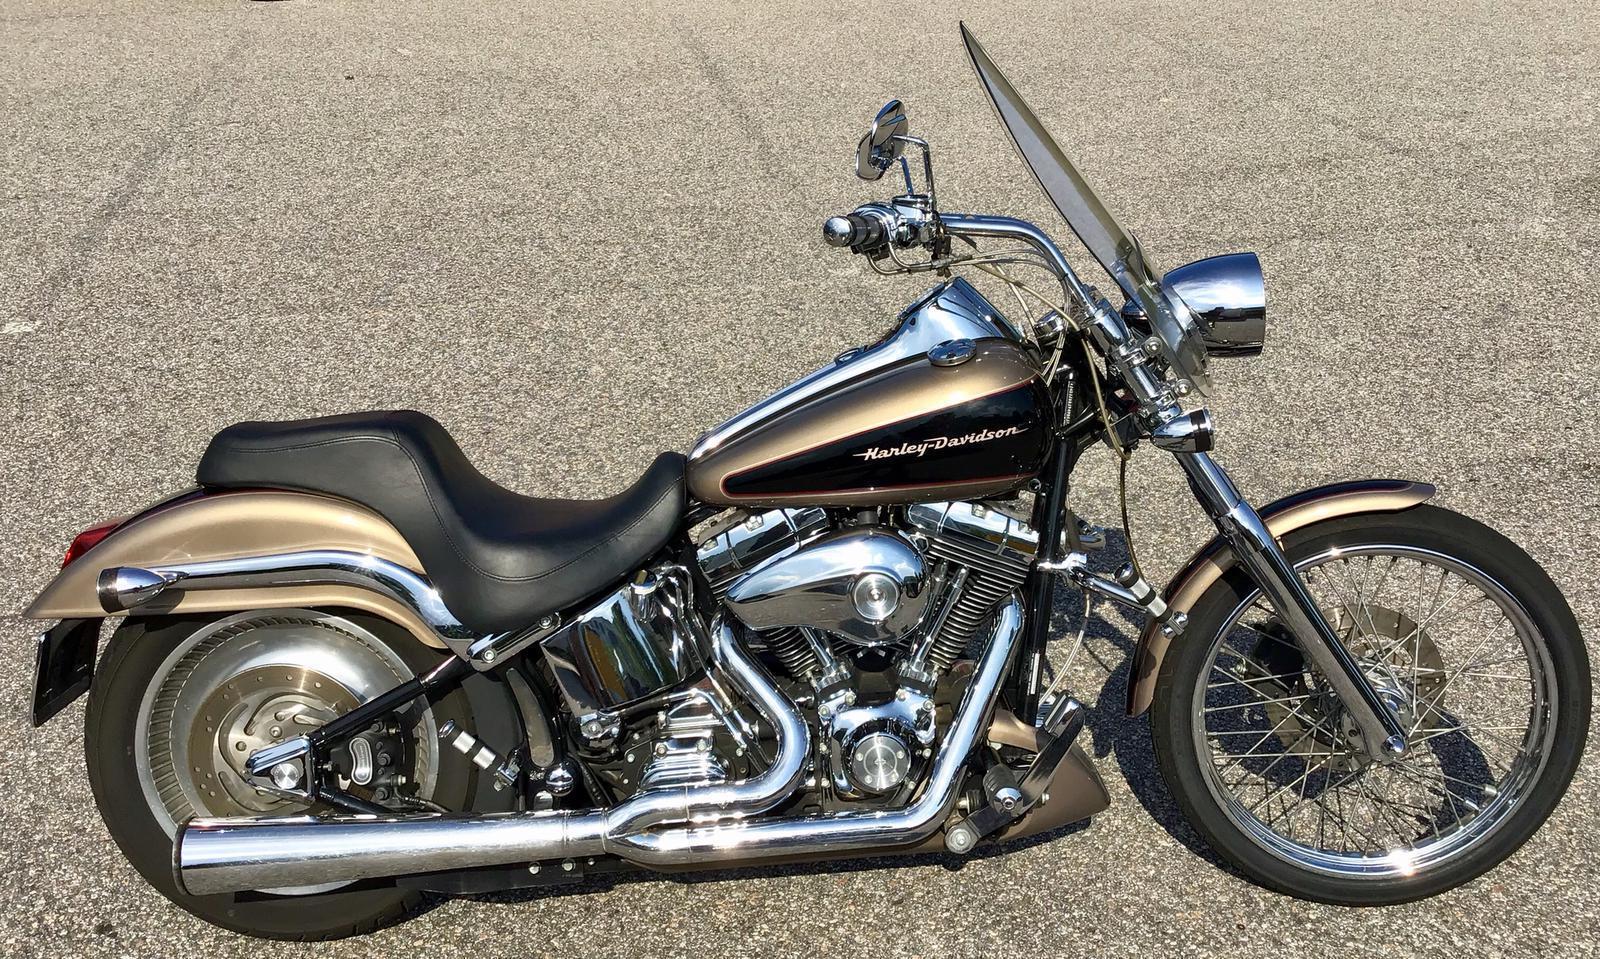 Harley Davidson Deuce >> 2004 Harley Davidson Softail Deuce